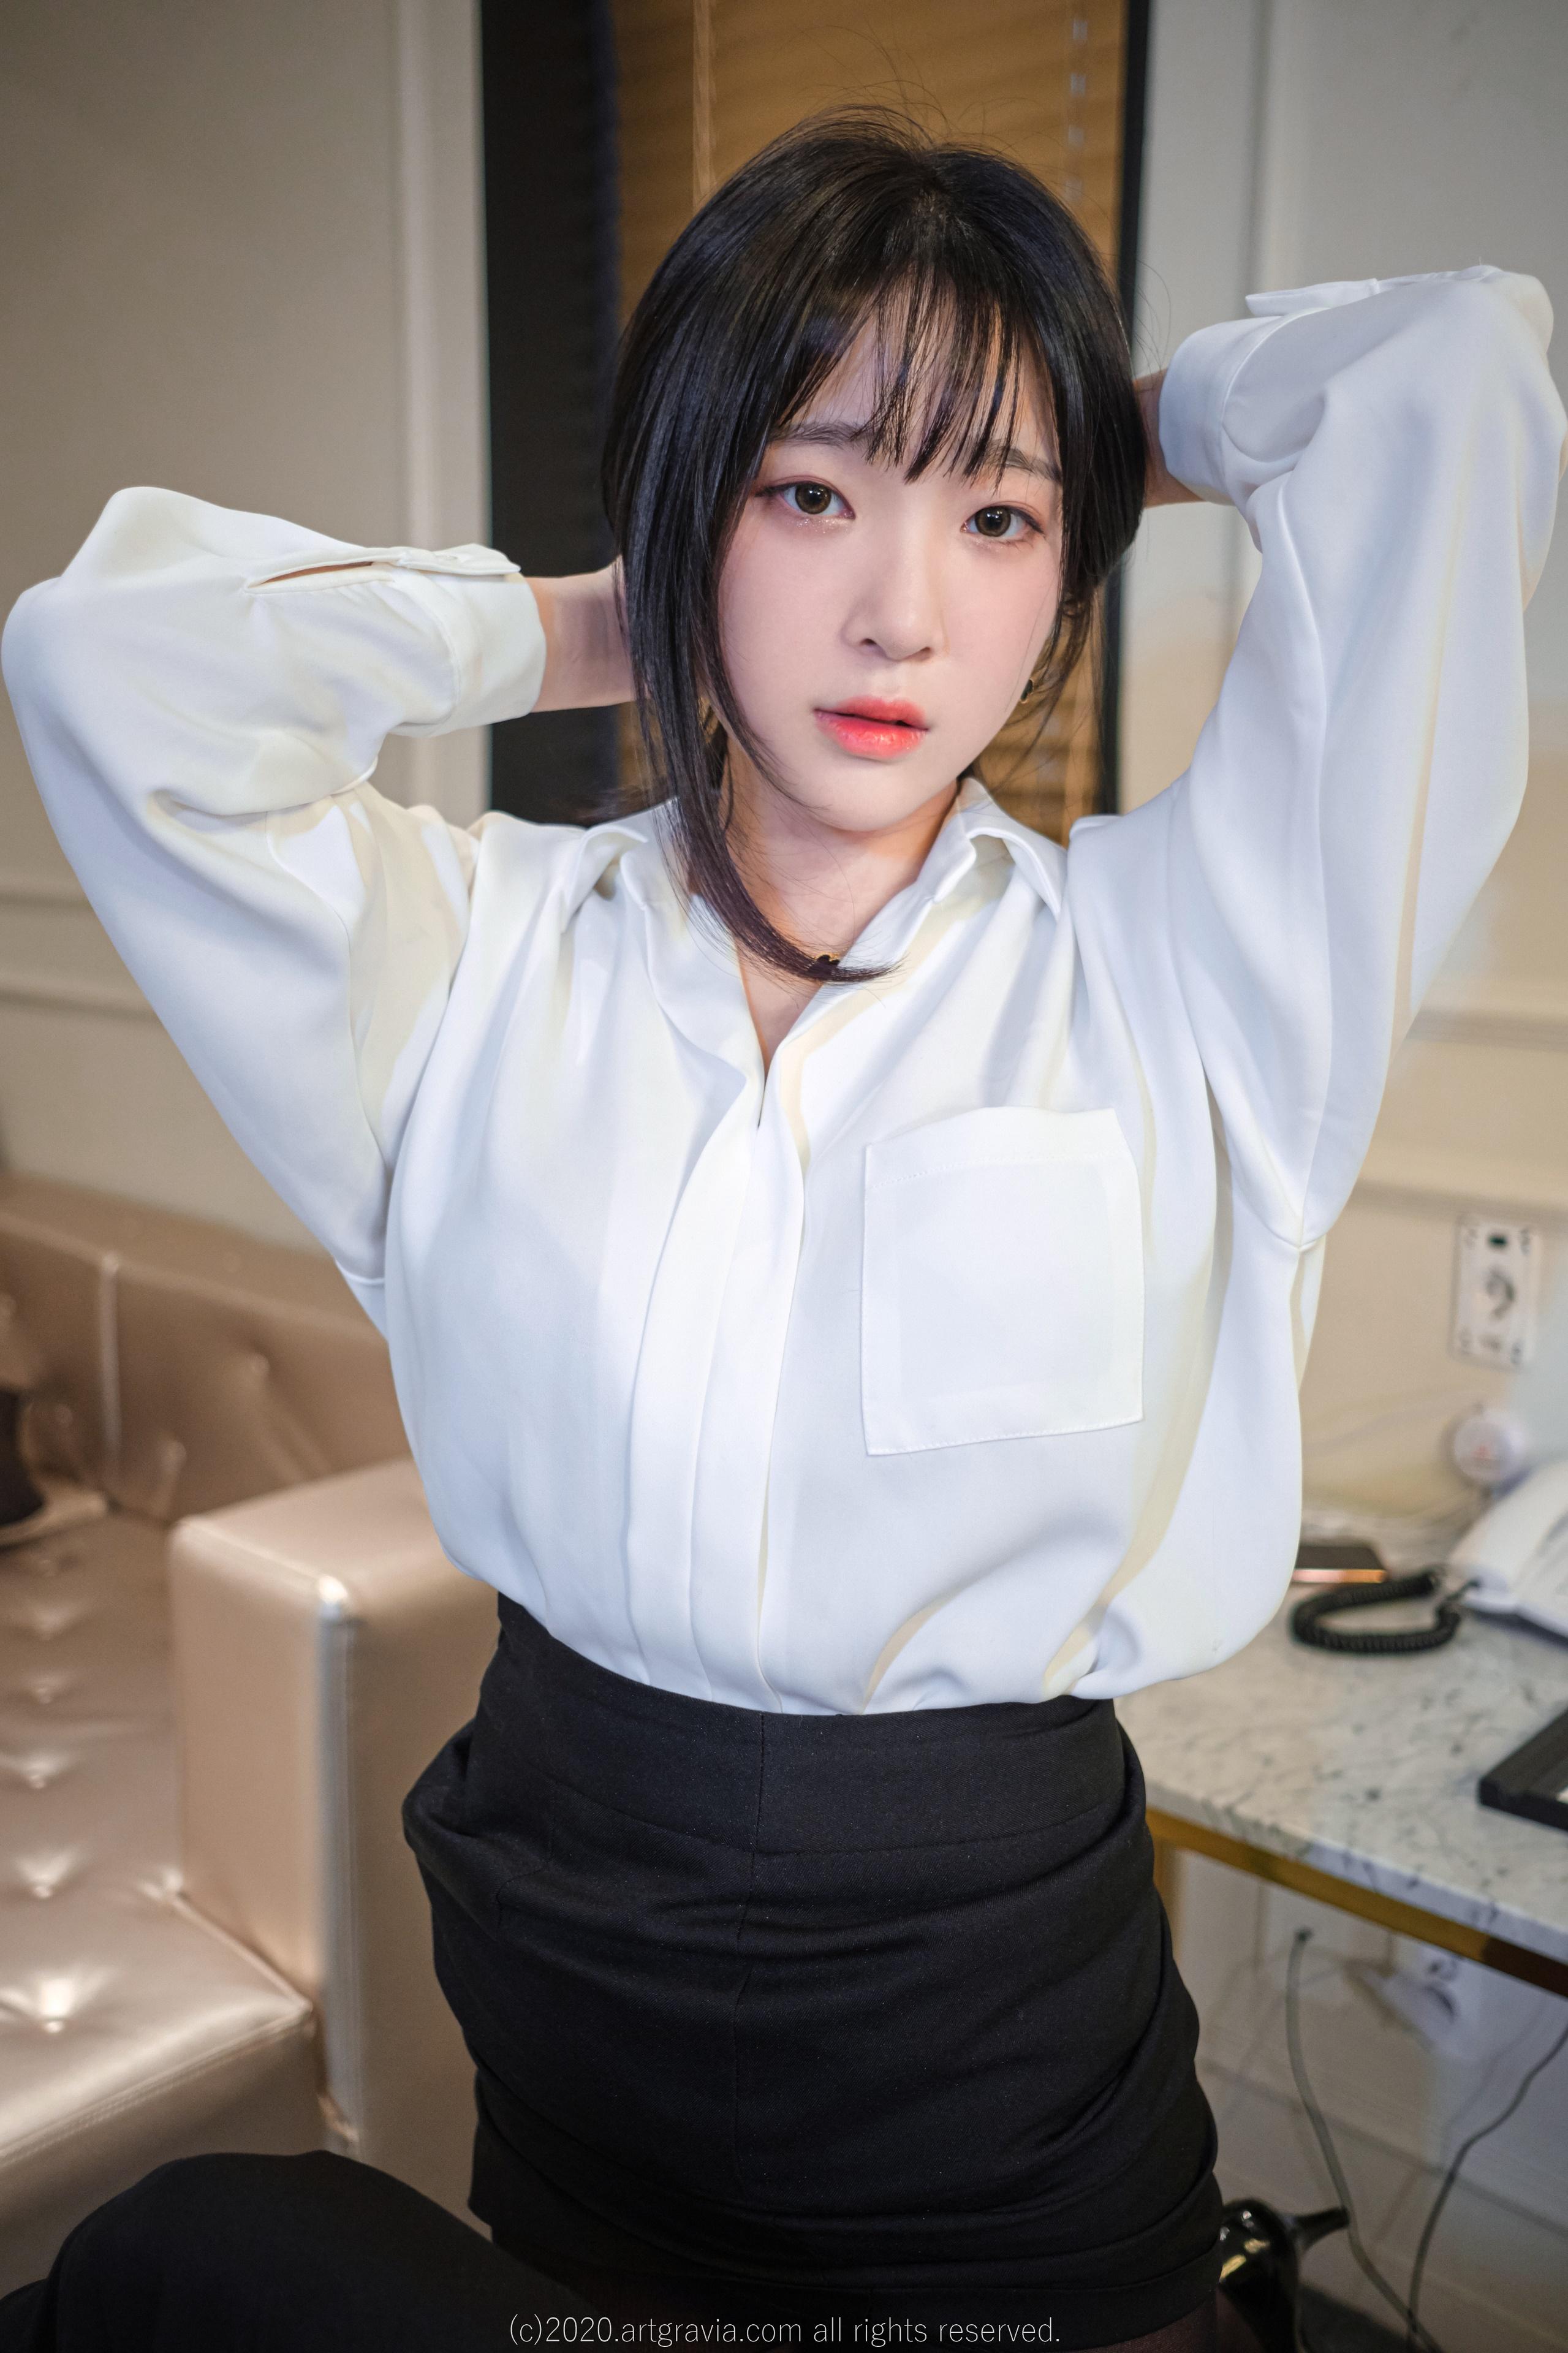 Korean Women Dark Hair Asian Women Women Indoors Looking At Viewer 2559x3840